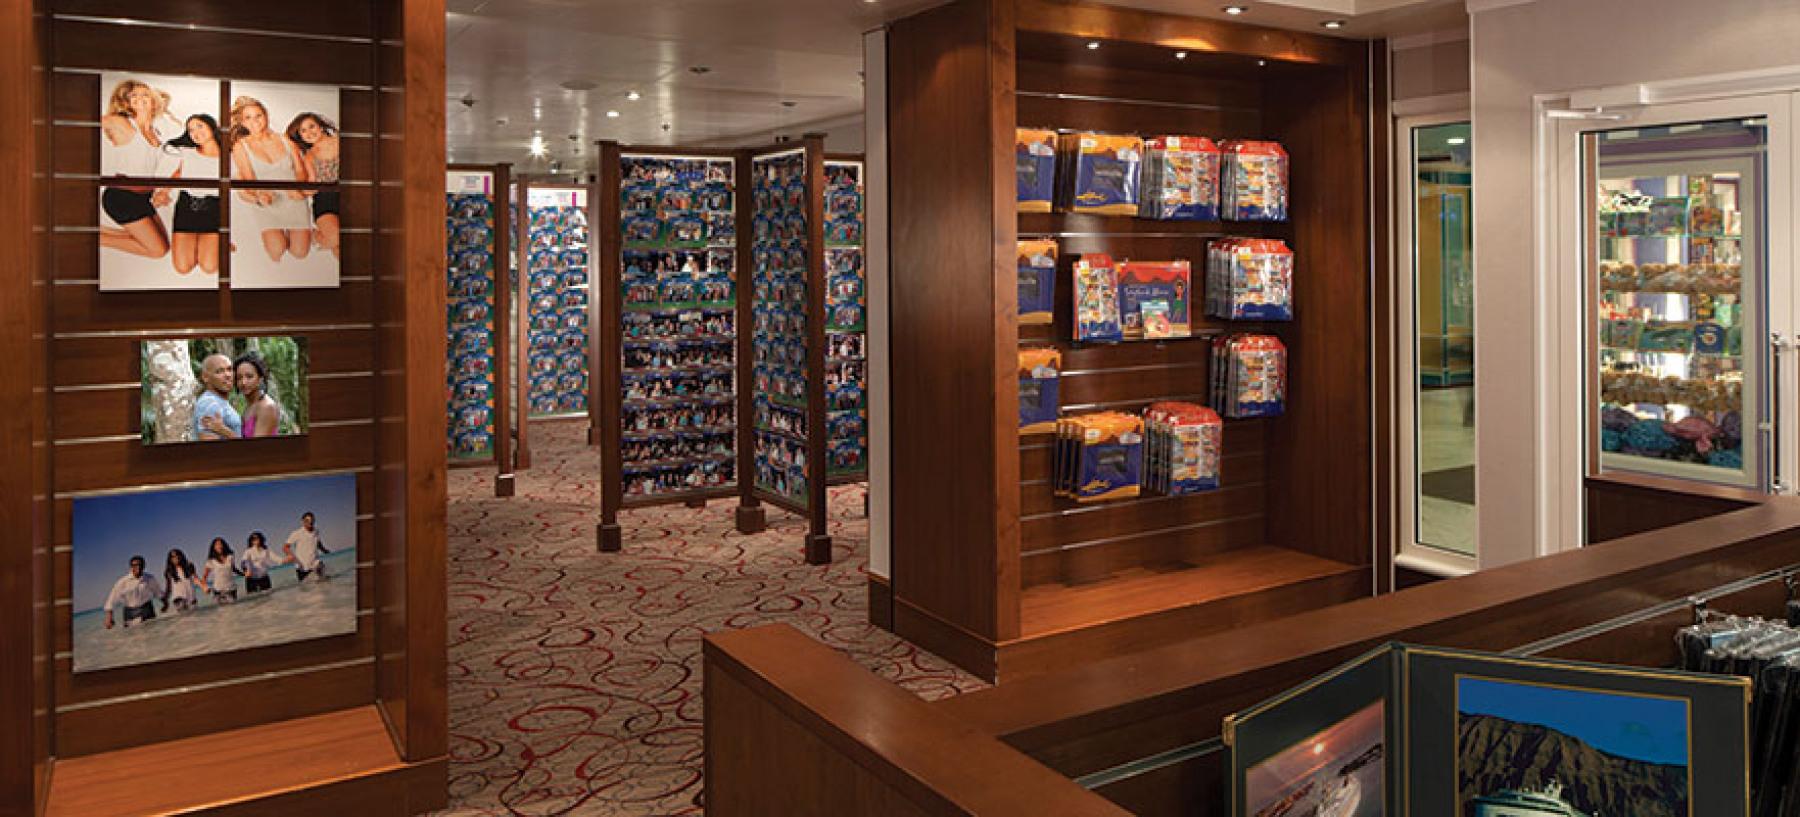 Norwegian Cruise Line Pride of America Interior photo gallery.jpg